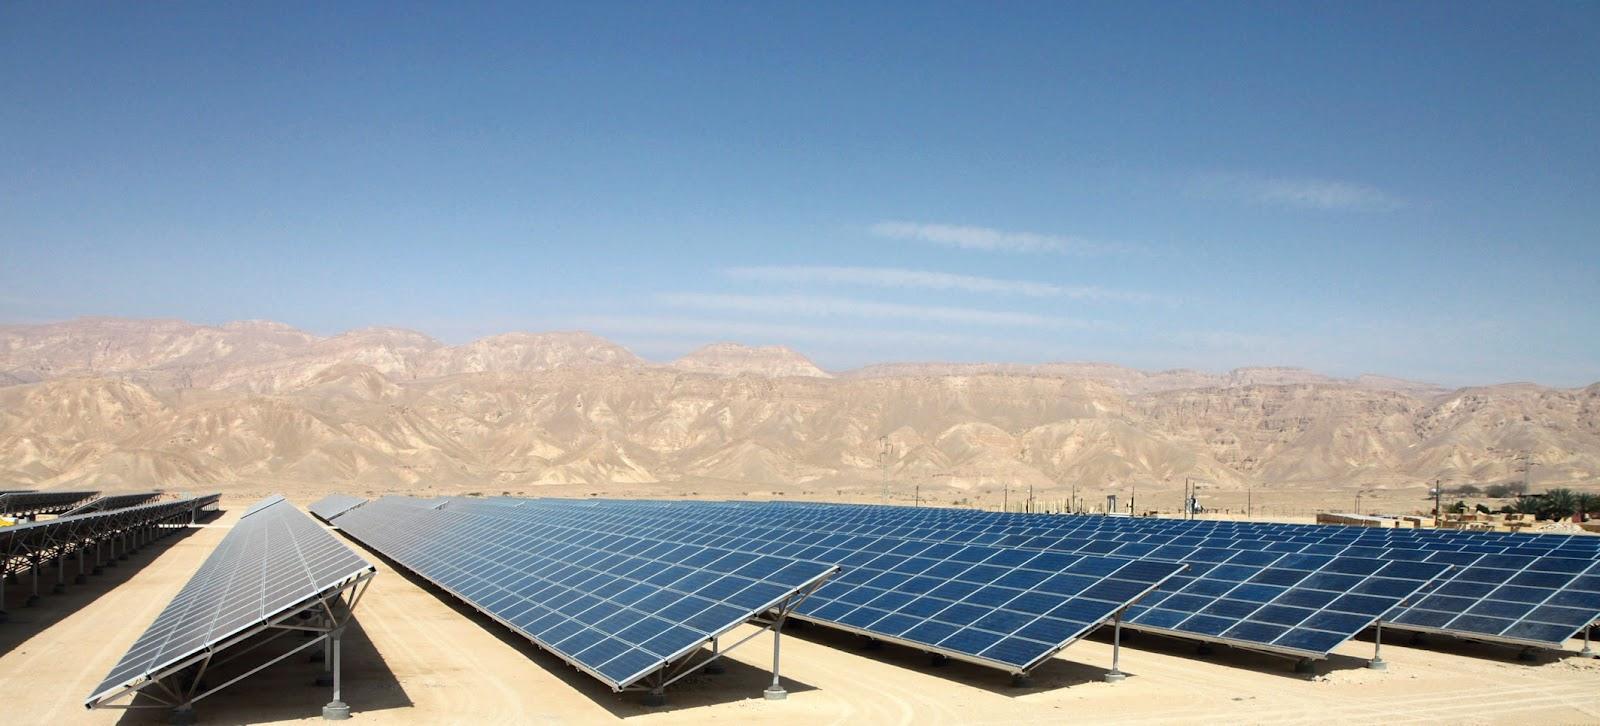 Photovoltaic+plant+Ketura,+Israel.jpg